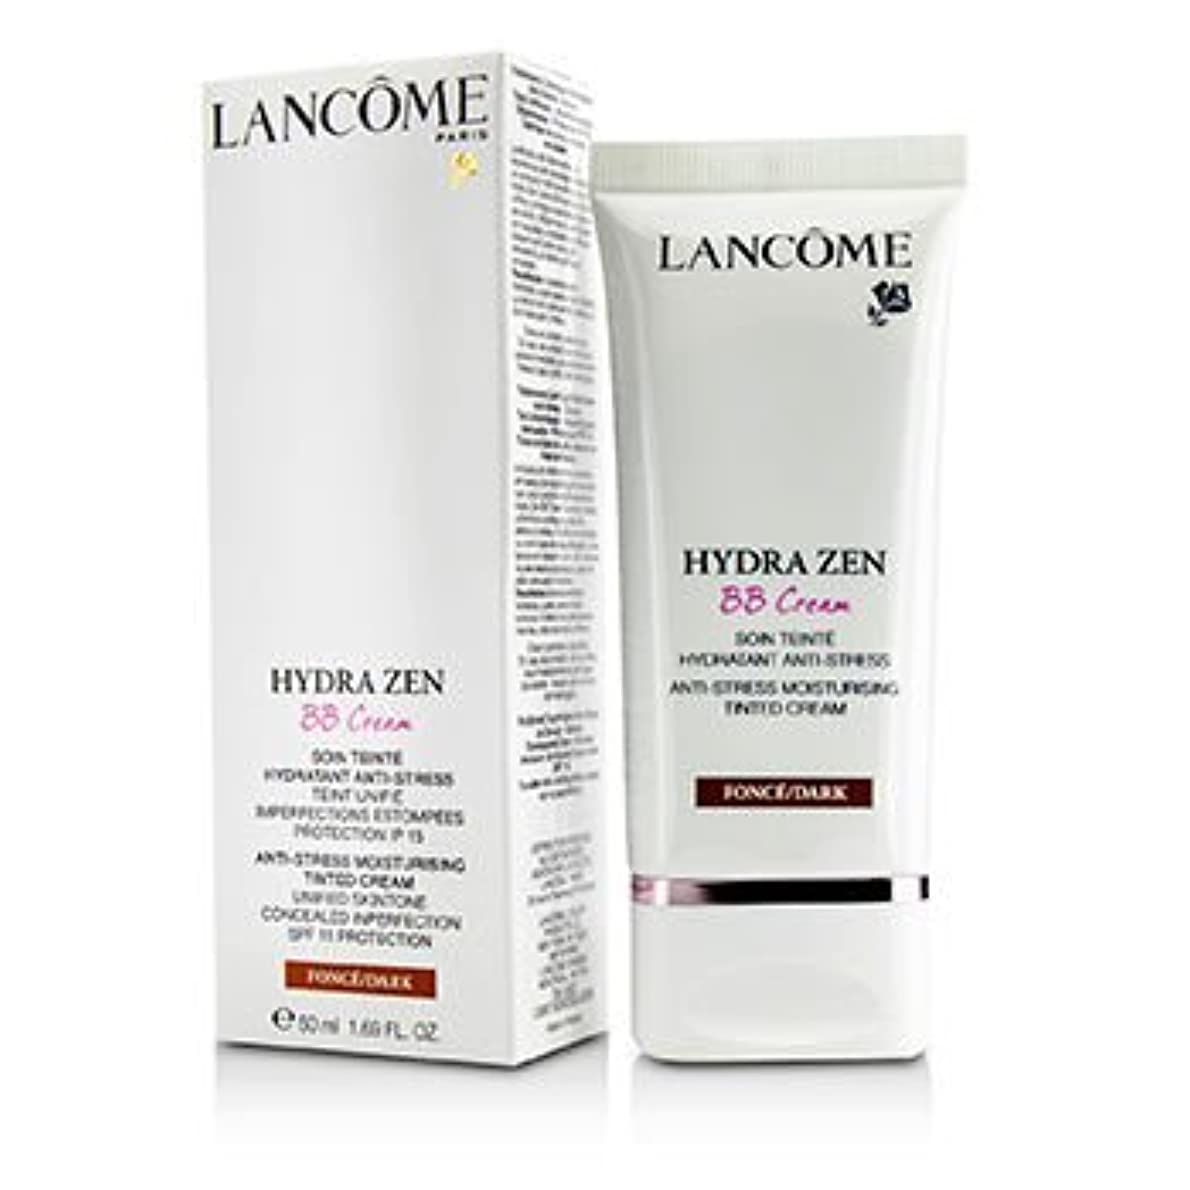 不明瞭誤小麦[Lancome] Lancome Hydra Zen (BB Cream) Anti-Stress Moisturising Tinted Cream SPF 15 - # Dark 50ml/1.69oz